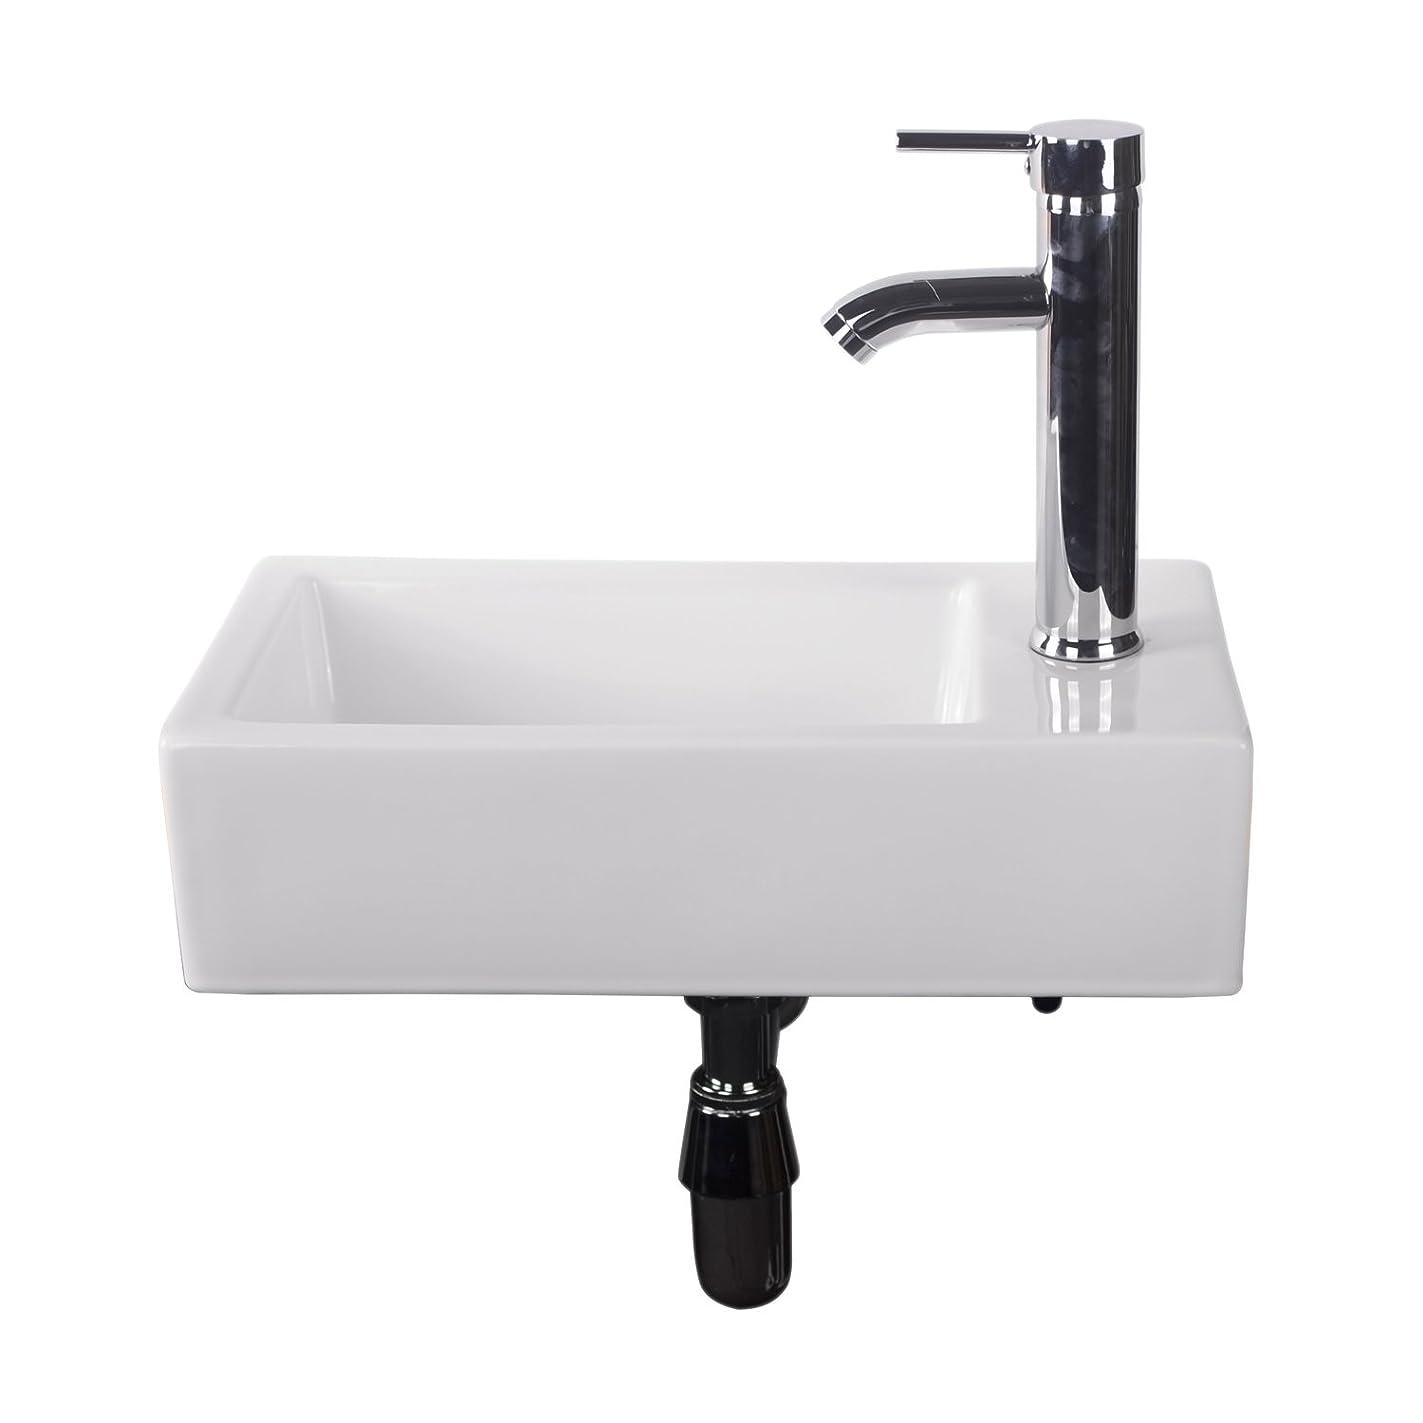 Walcut Bathroom Wall Mount Rectangle Corner Sink White Porcelain Ceramic Vessel Sink & Chrome Faucet Combo